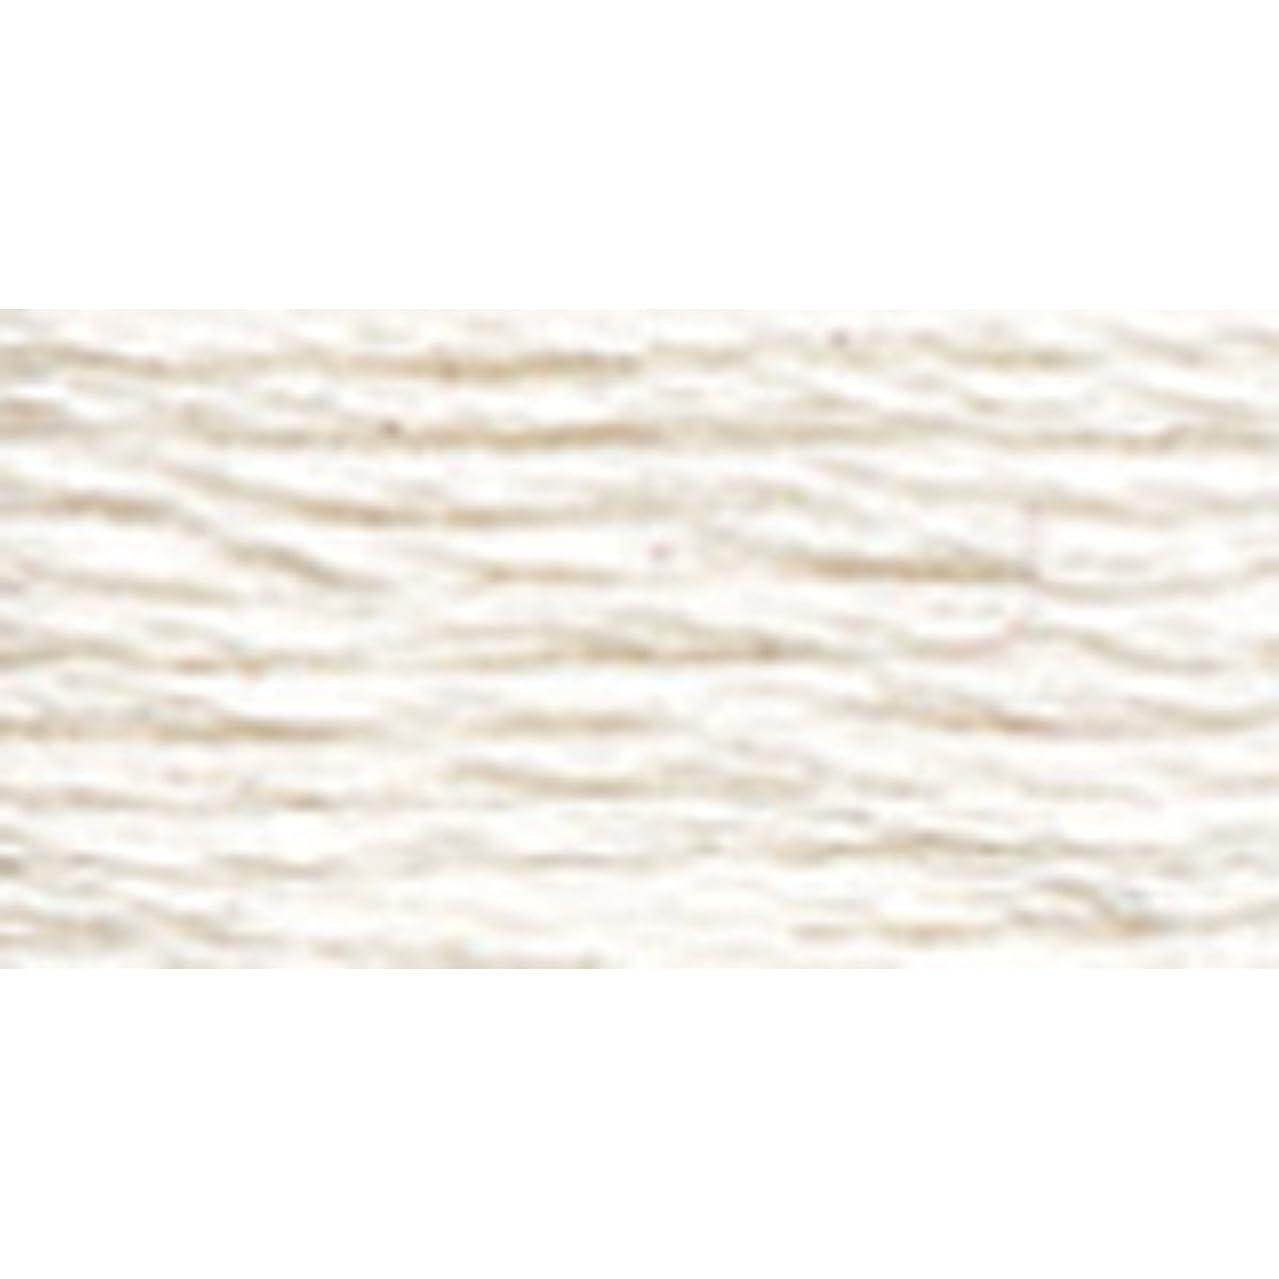 DMC 116 8-BLANC Pearl Cotton Thread Balls, White, Size 8